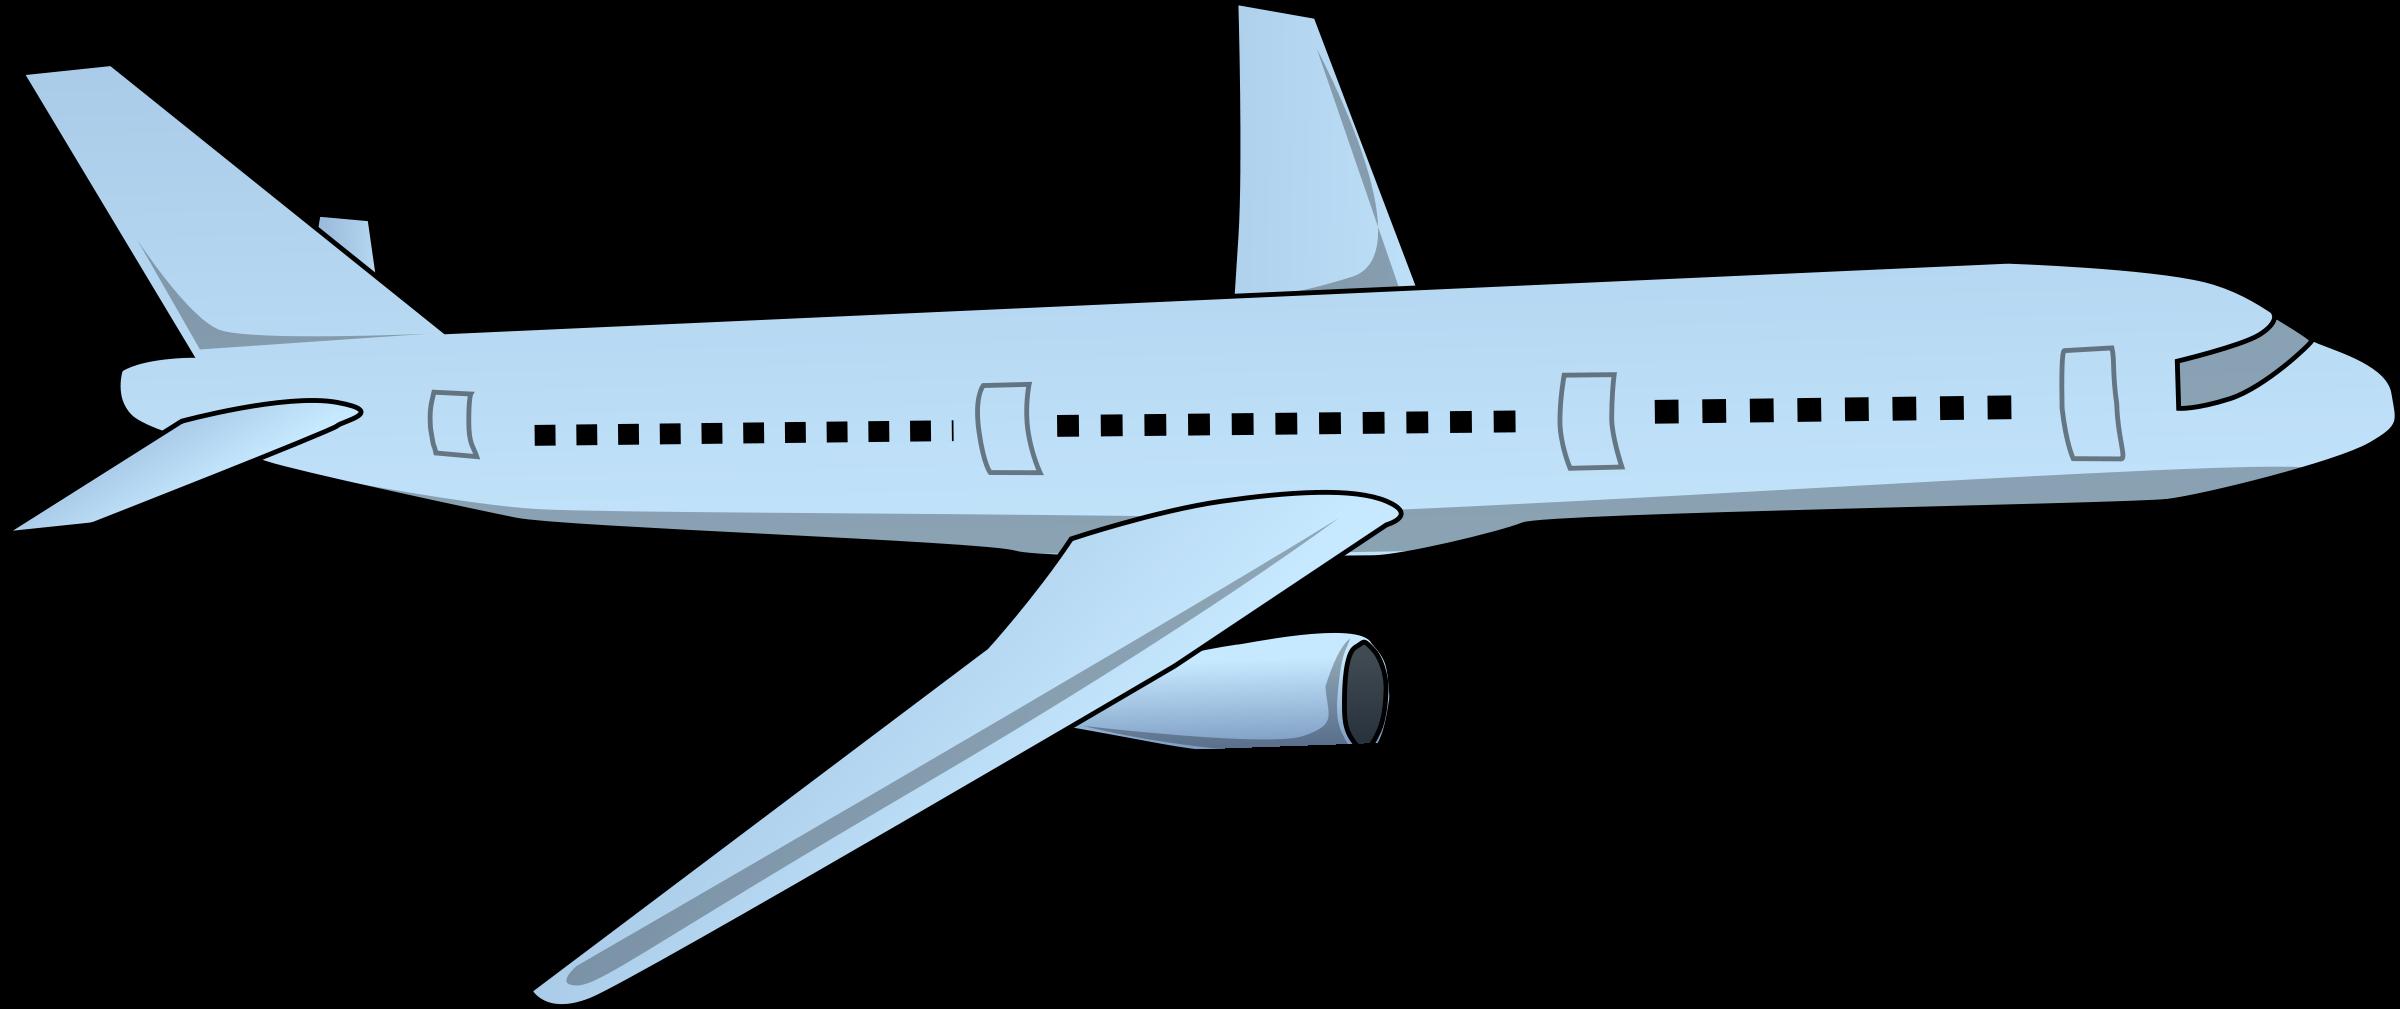 Southwest plane clipart transparent freeuse stock Southwest plane clipart transparent - ClipartFest freeuse stock